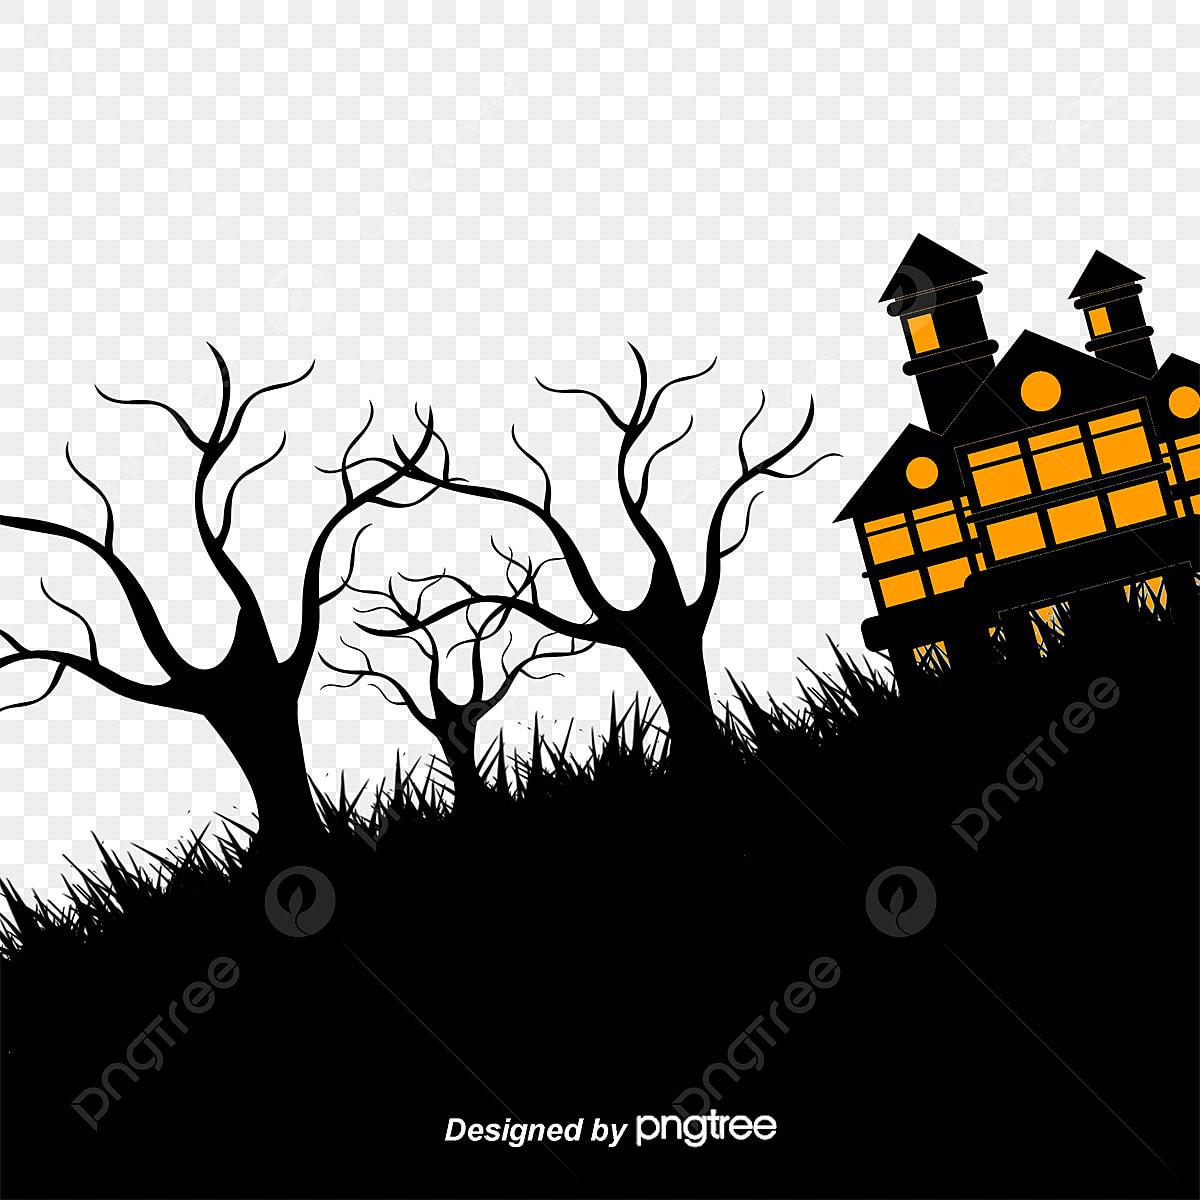 Halloween Vector Black And White.Halloween Black Mountain House Halloween Vector Mountain Png And